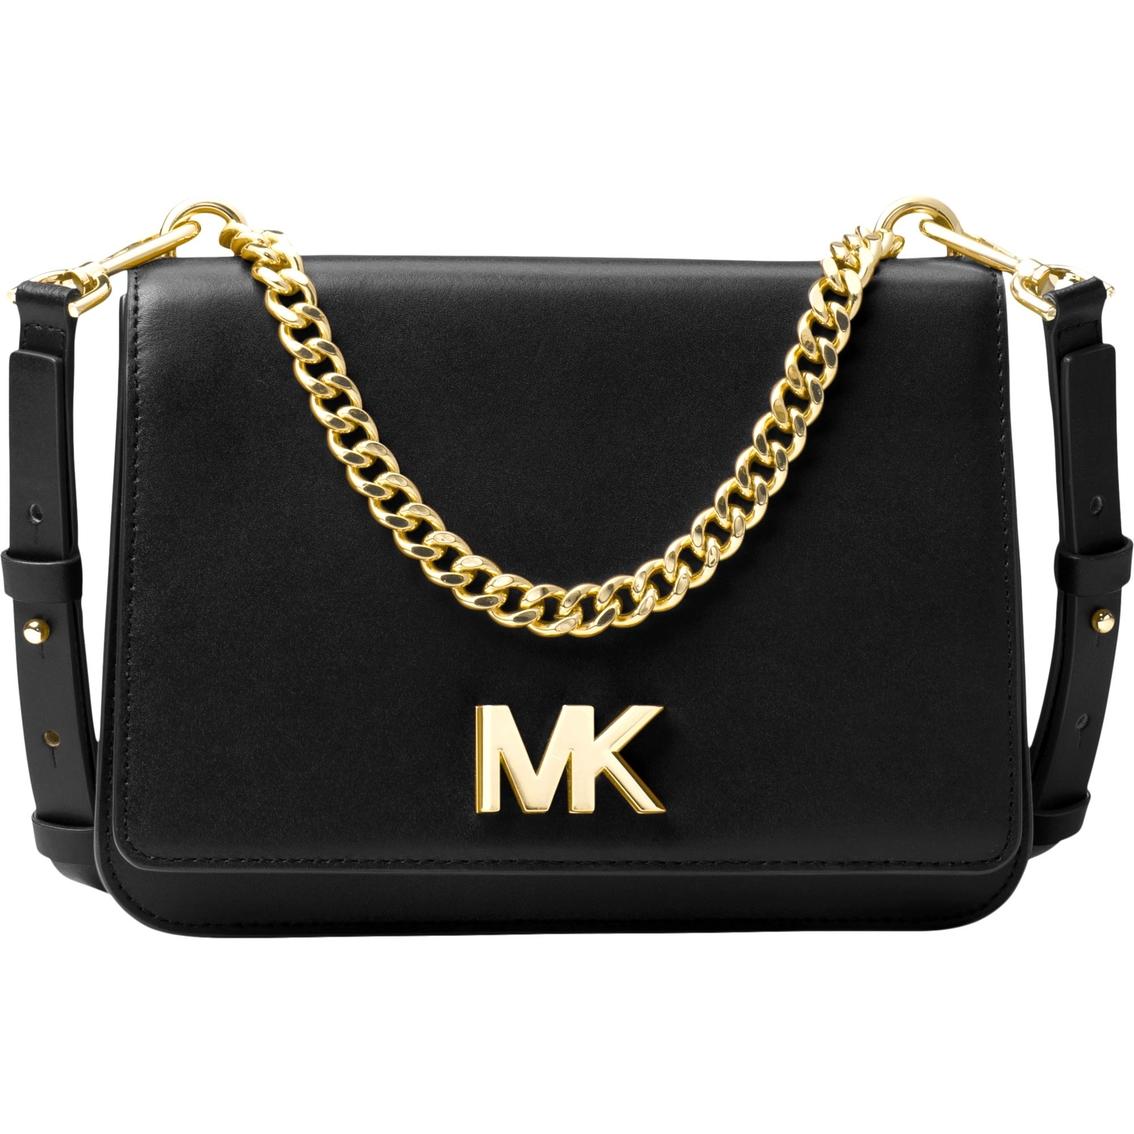 67f38fe5debc Michael Kors Mott Shoulder Bag Leather